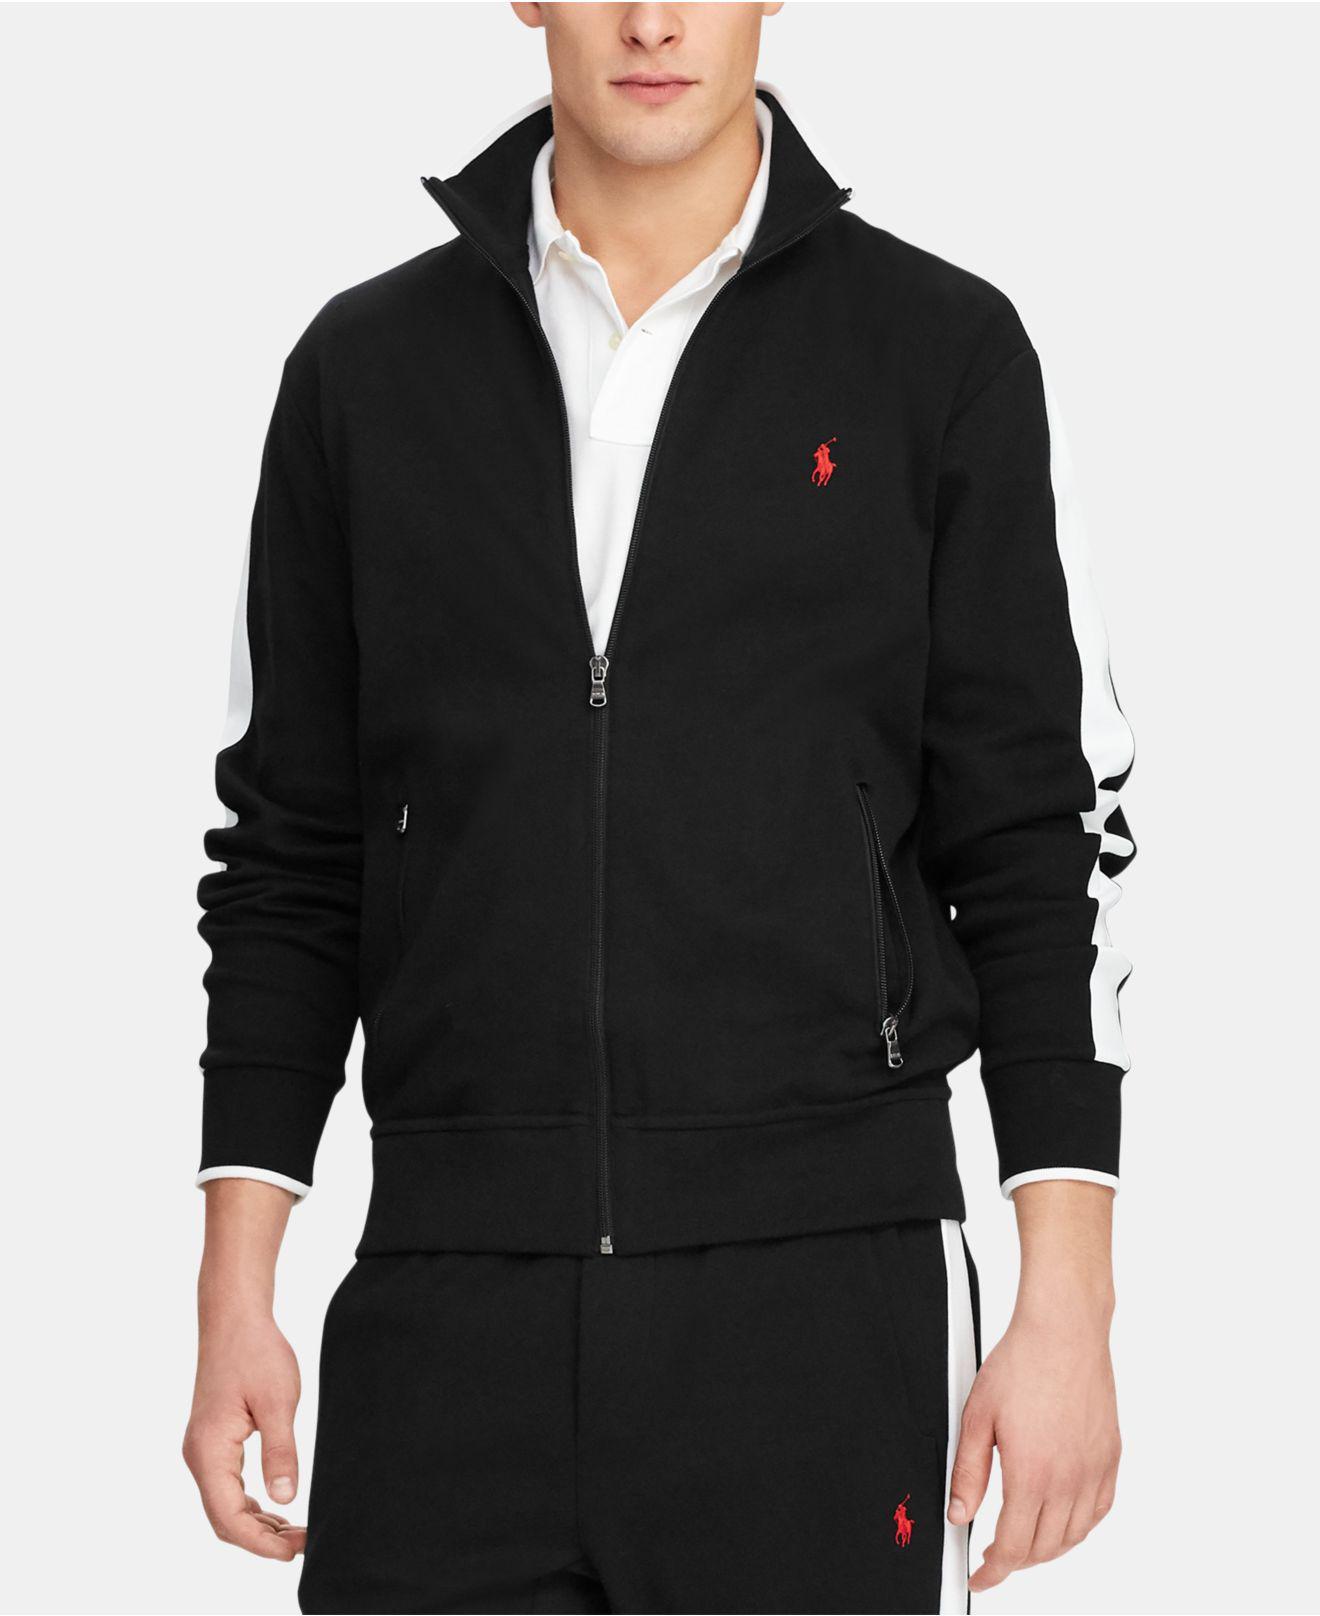 0da86dbae0dd Lyst - Polo Ralph Lauren Interlock Cotton Track Jacket in Black for Men